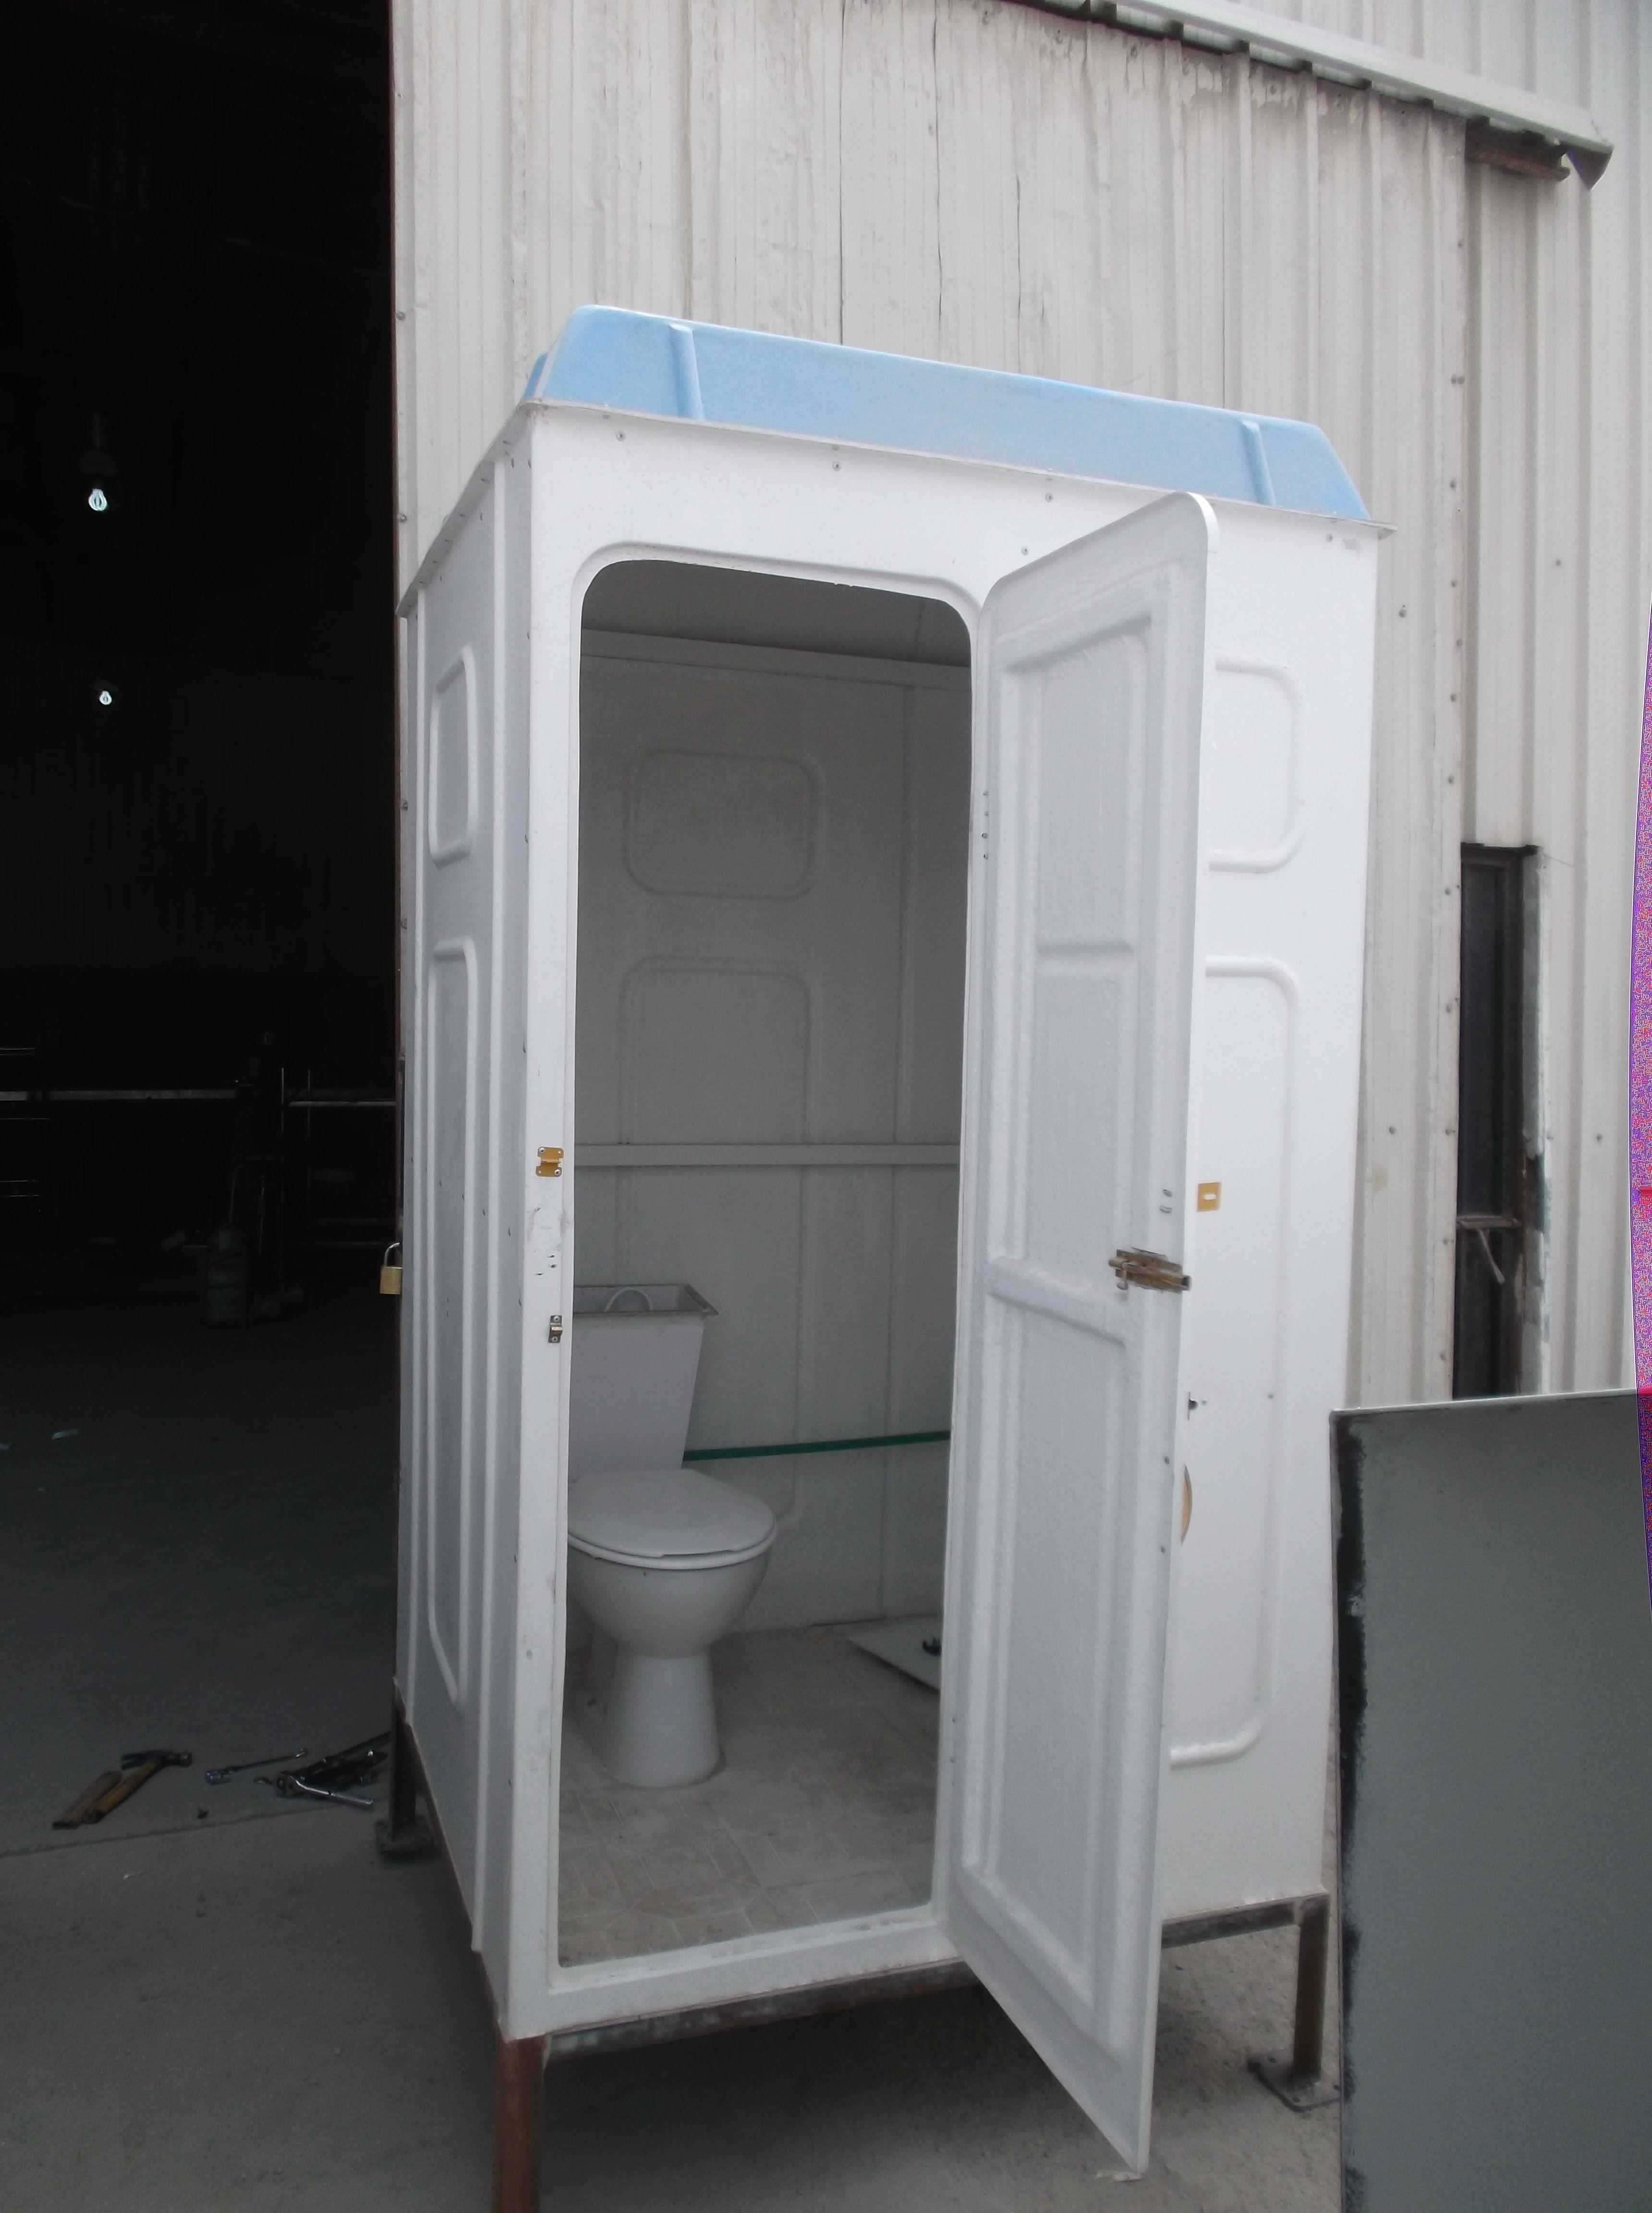 10 Awesome Portable Public Bathroom Portable Bathroom Public